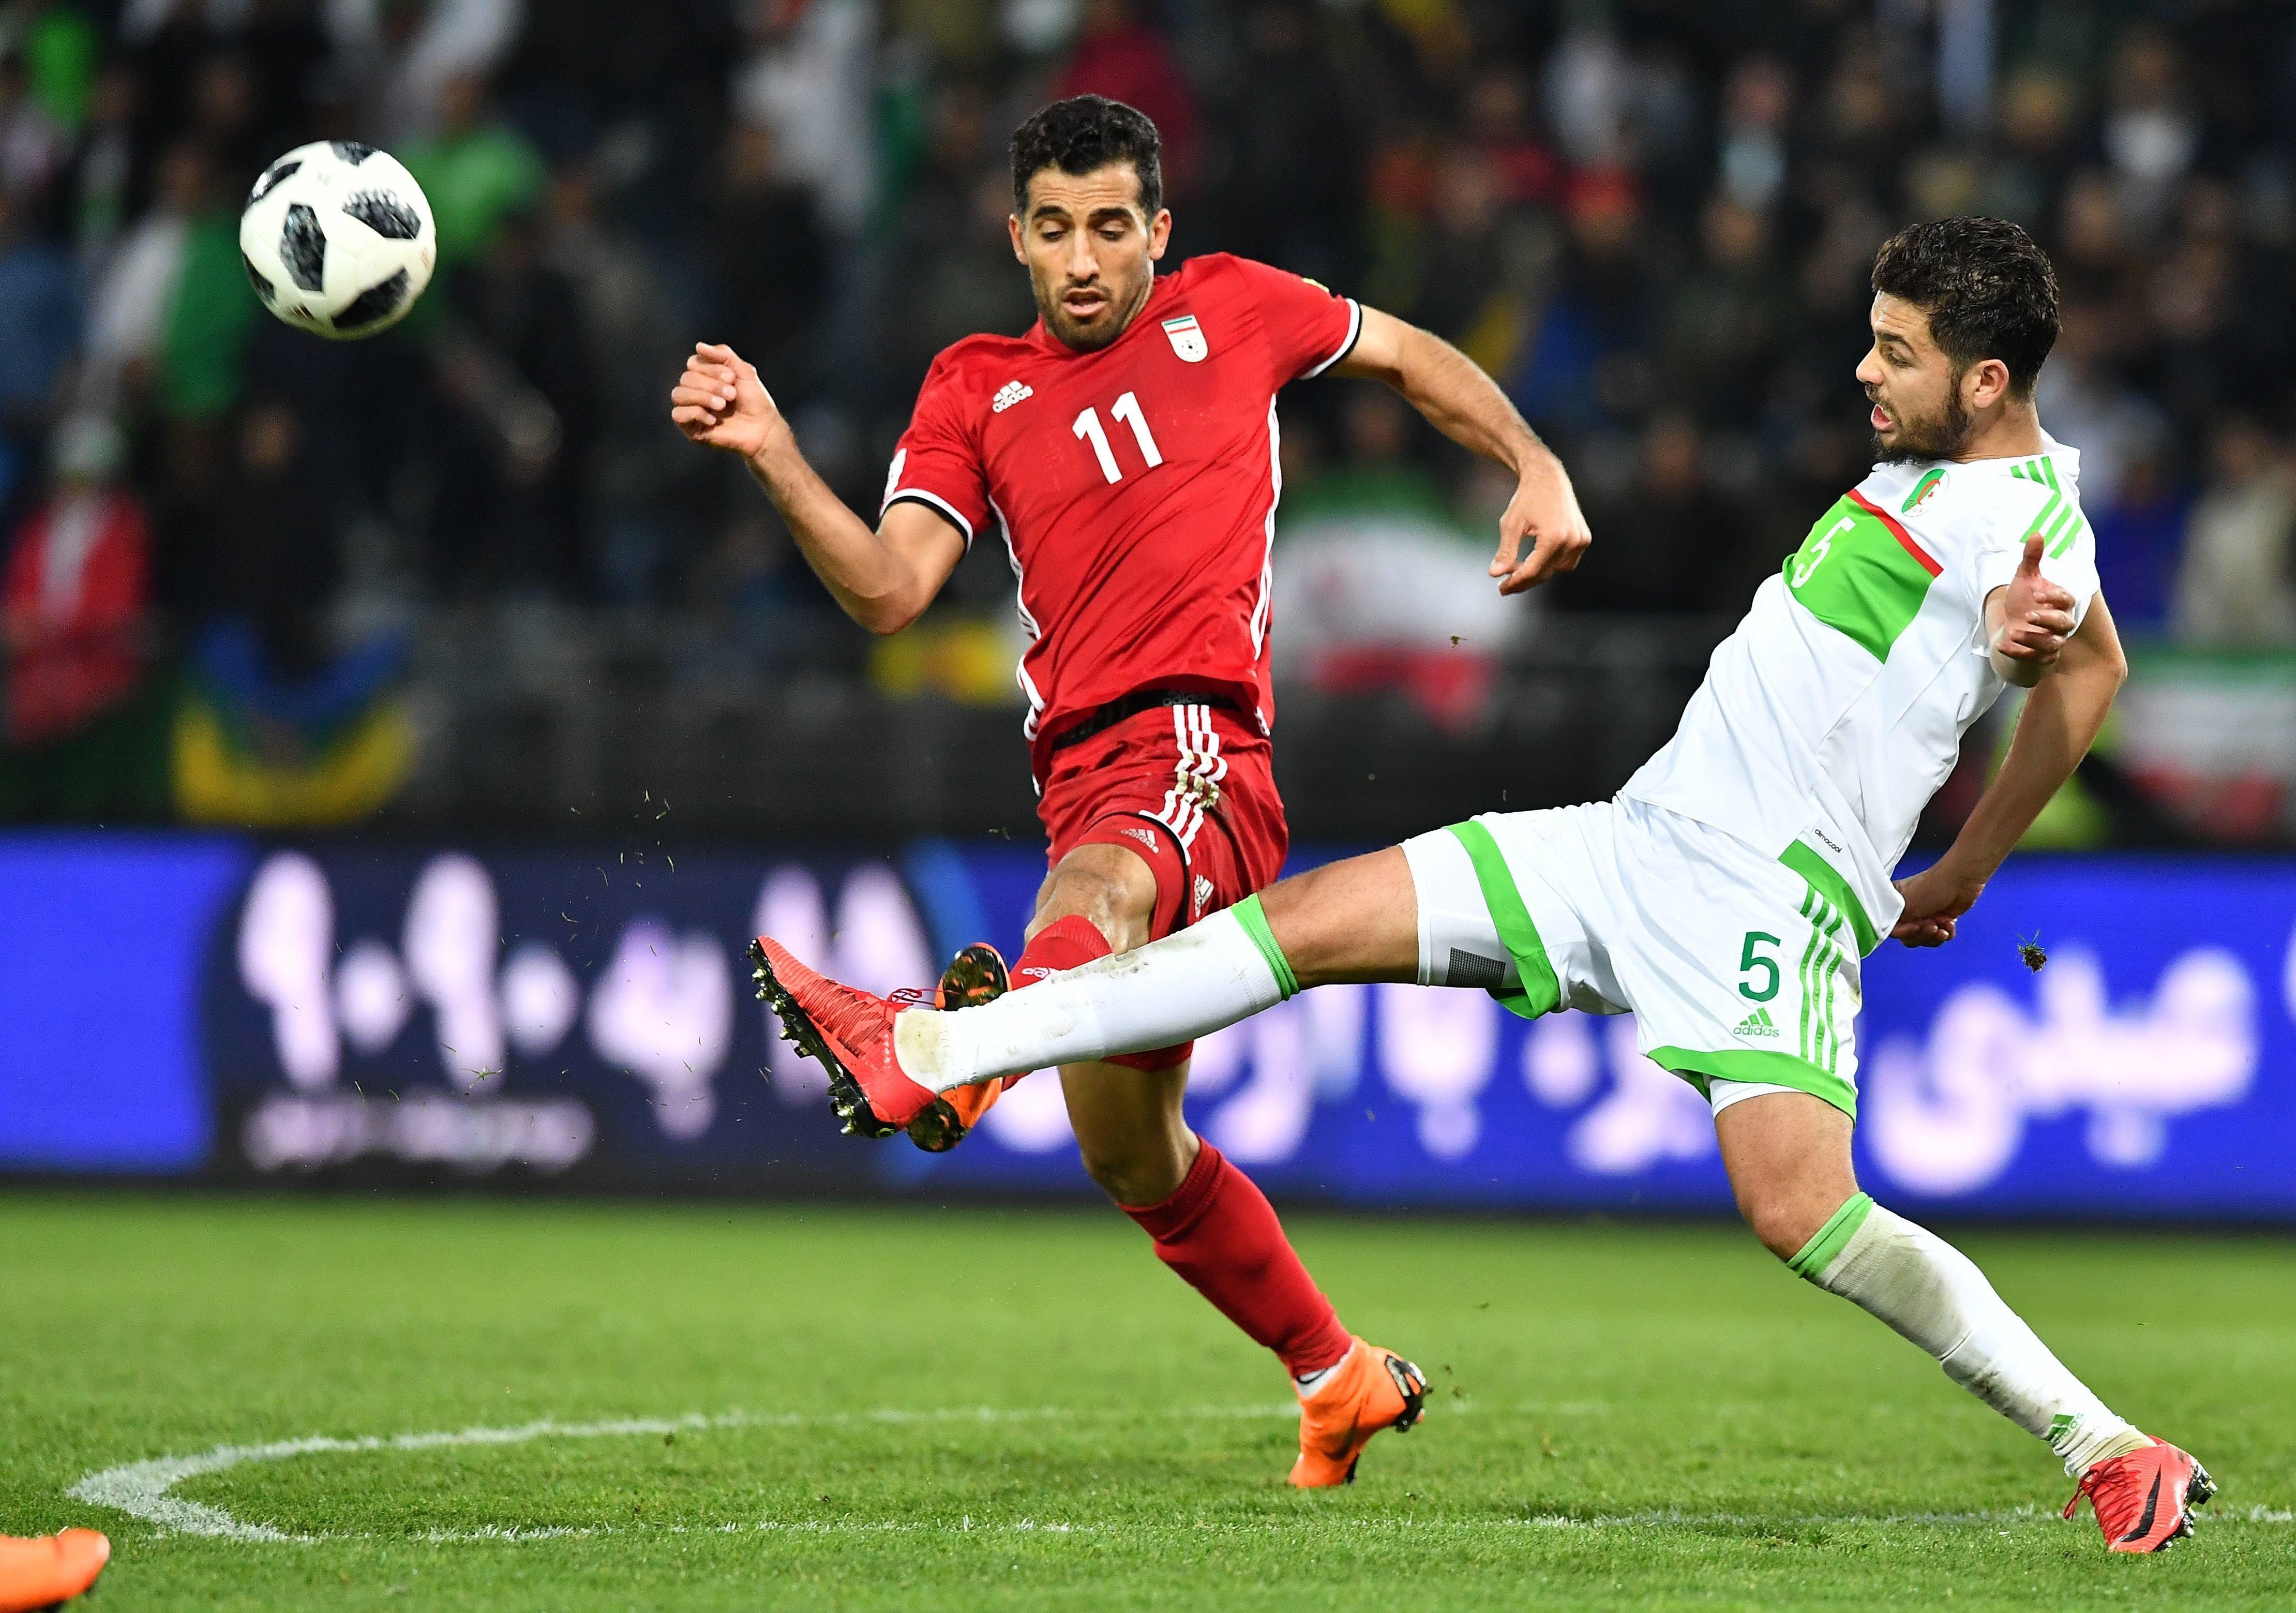 Bond historique de la Tunisie, 14e mondiale — Classement FIFA